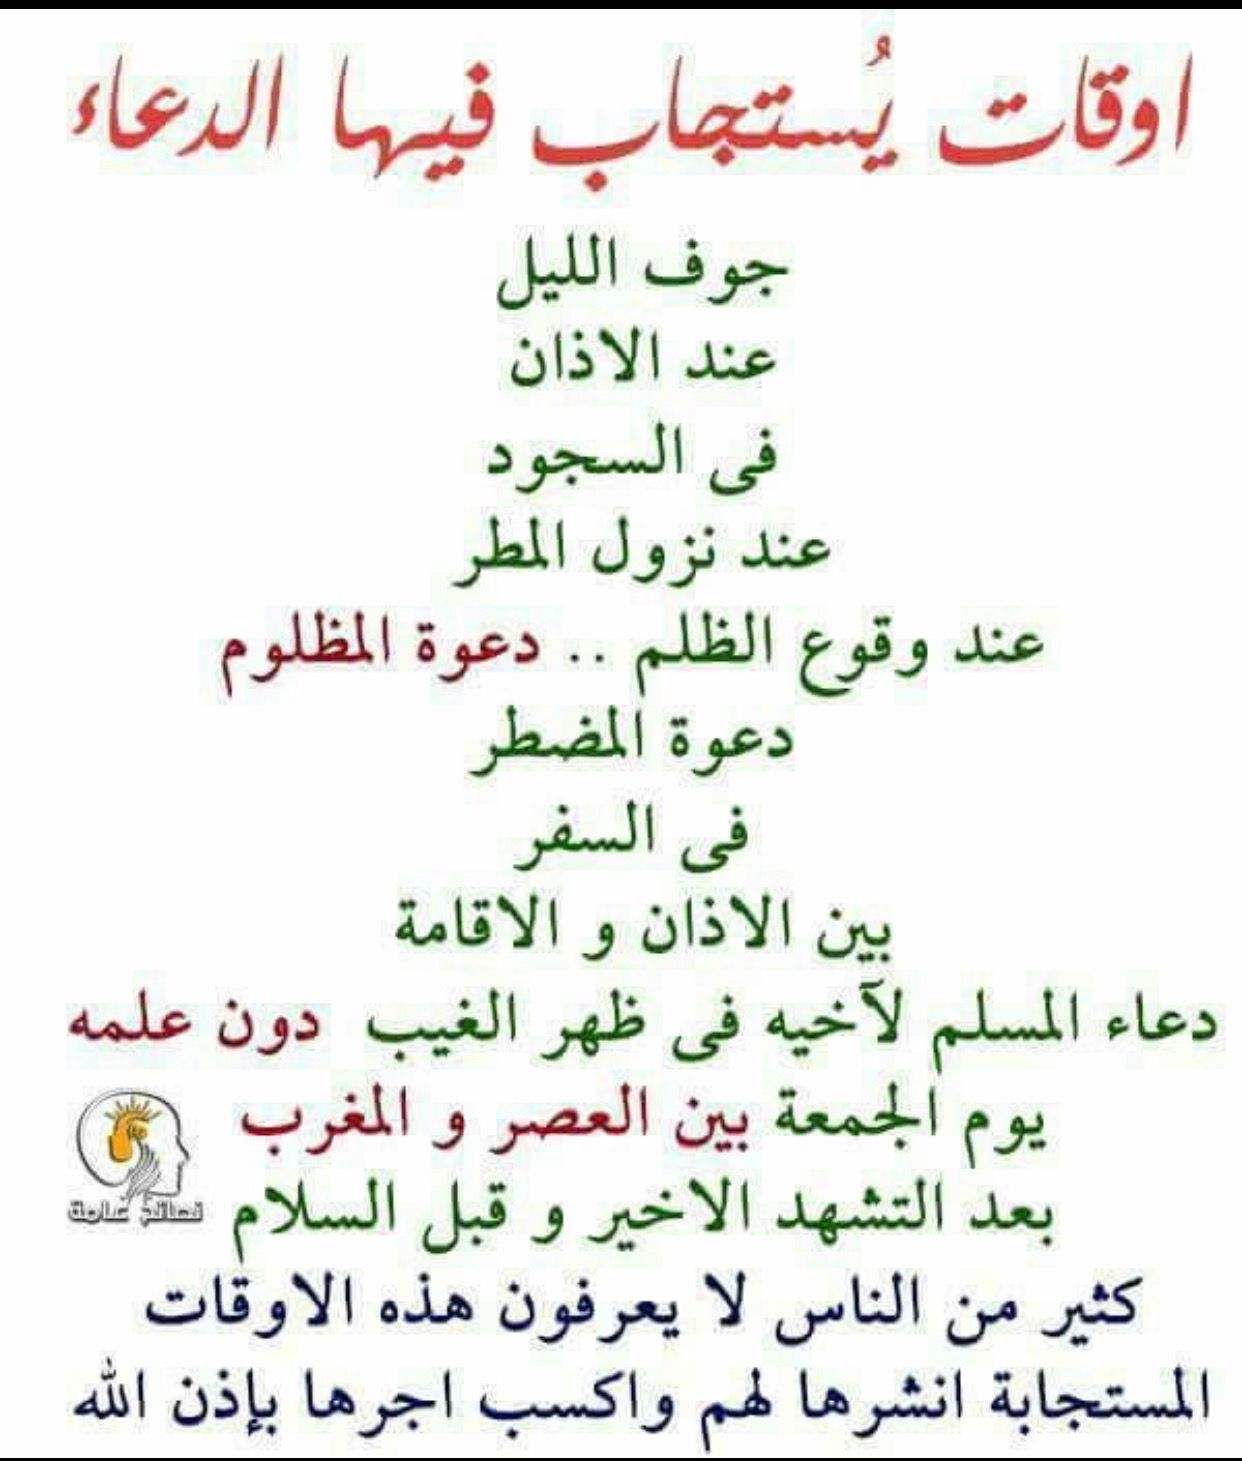 Pin By Wafa On اذكارات Islamic Phrases Islam Facts Islam Beliefs